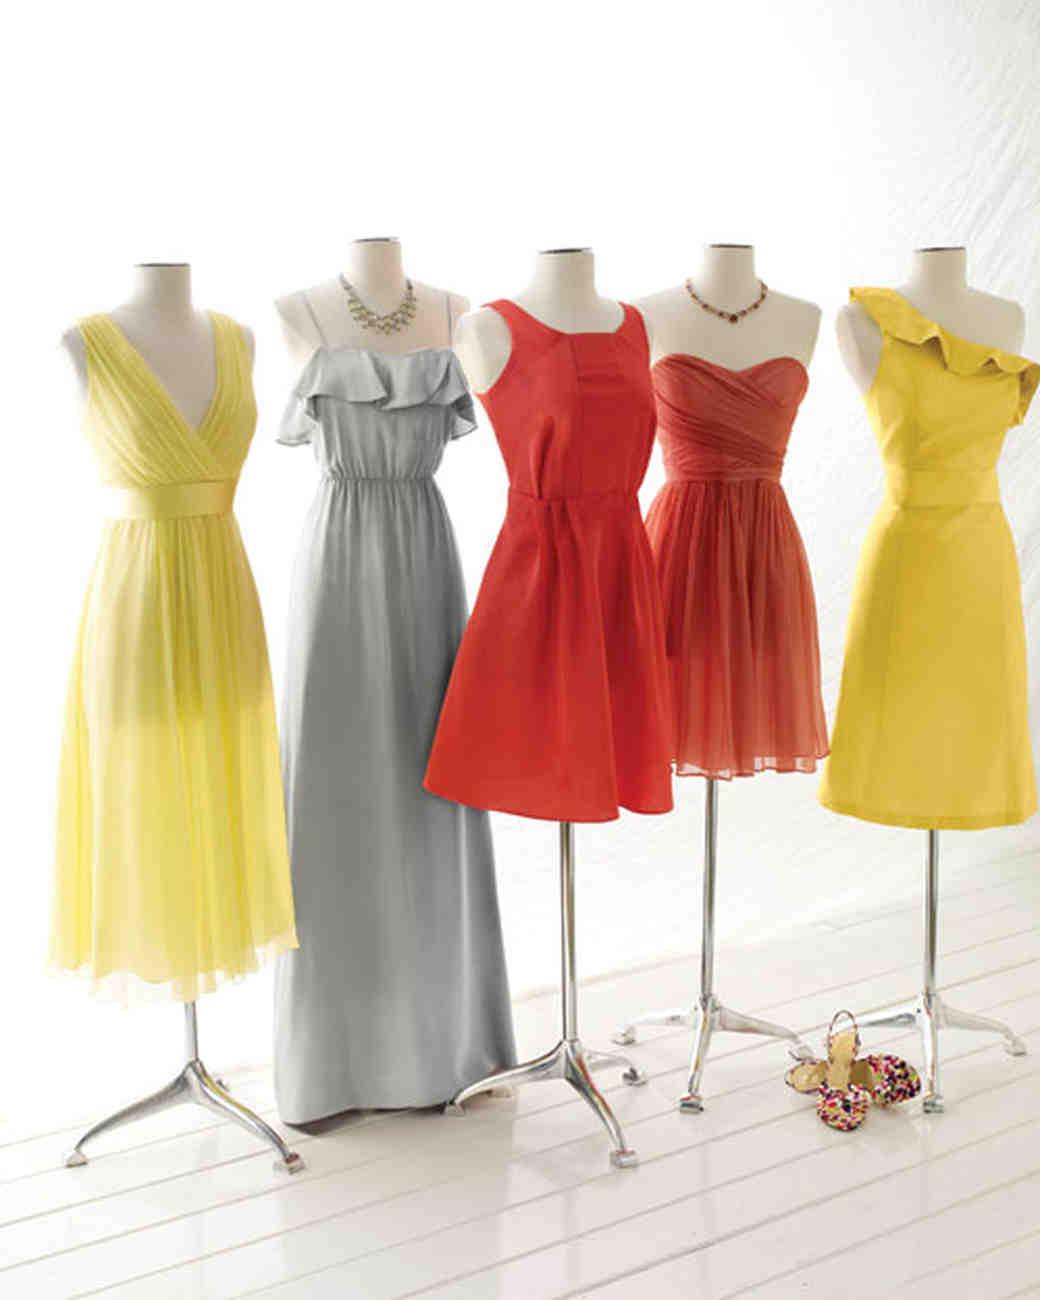 mwd106651_spr11_dress073.jpg